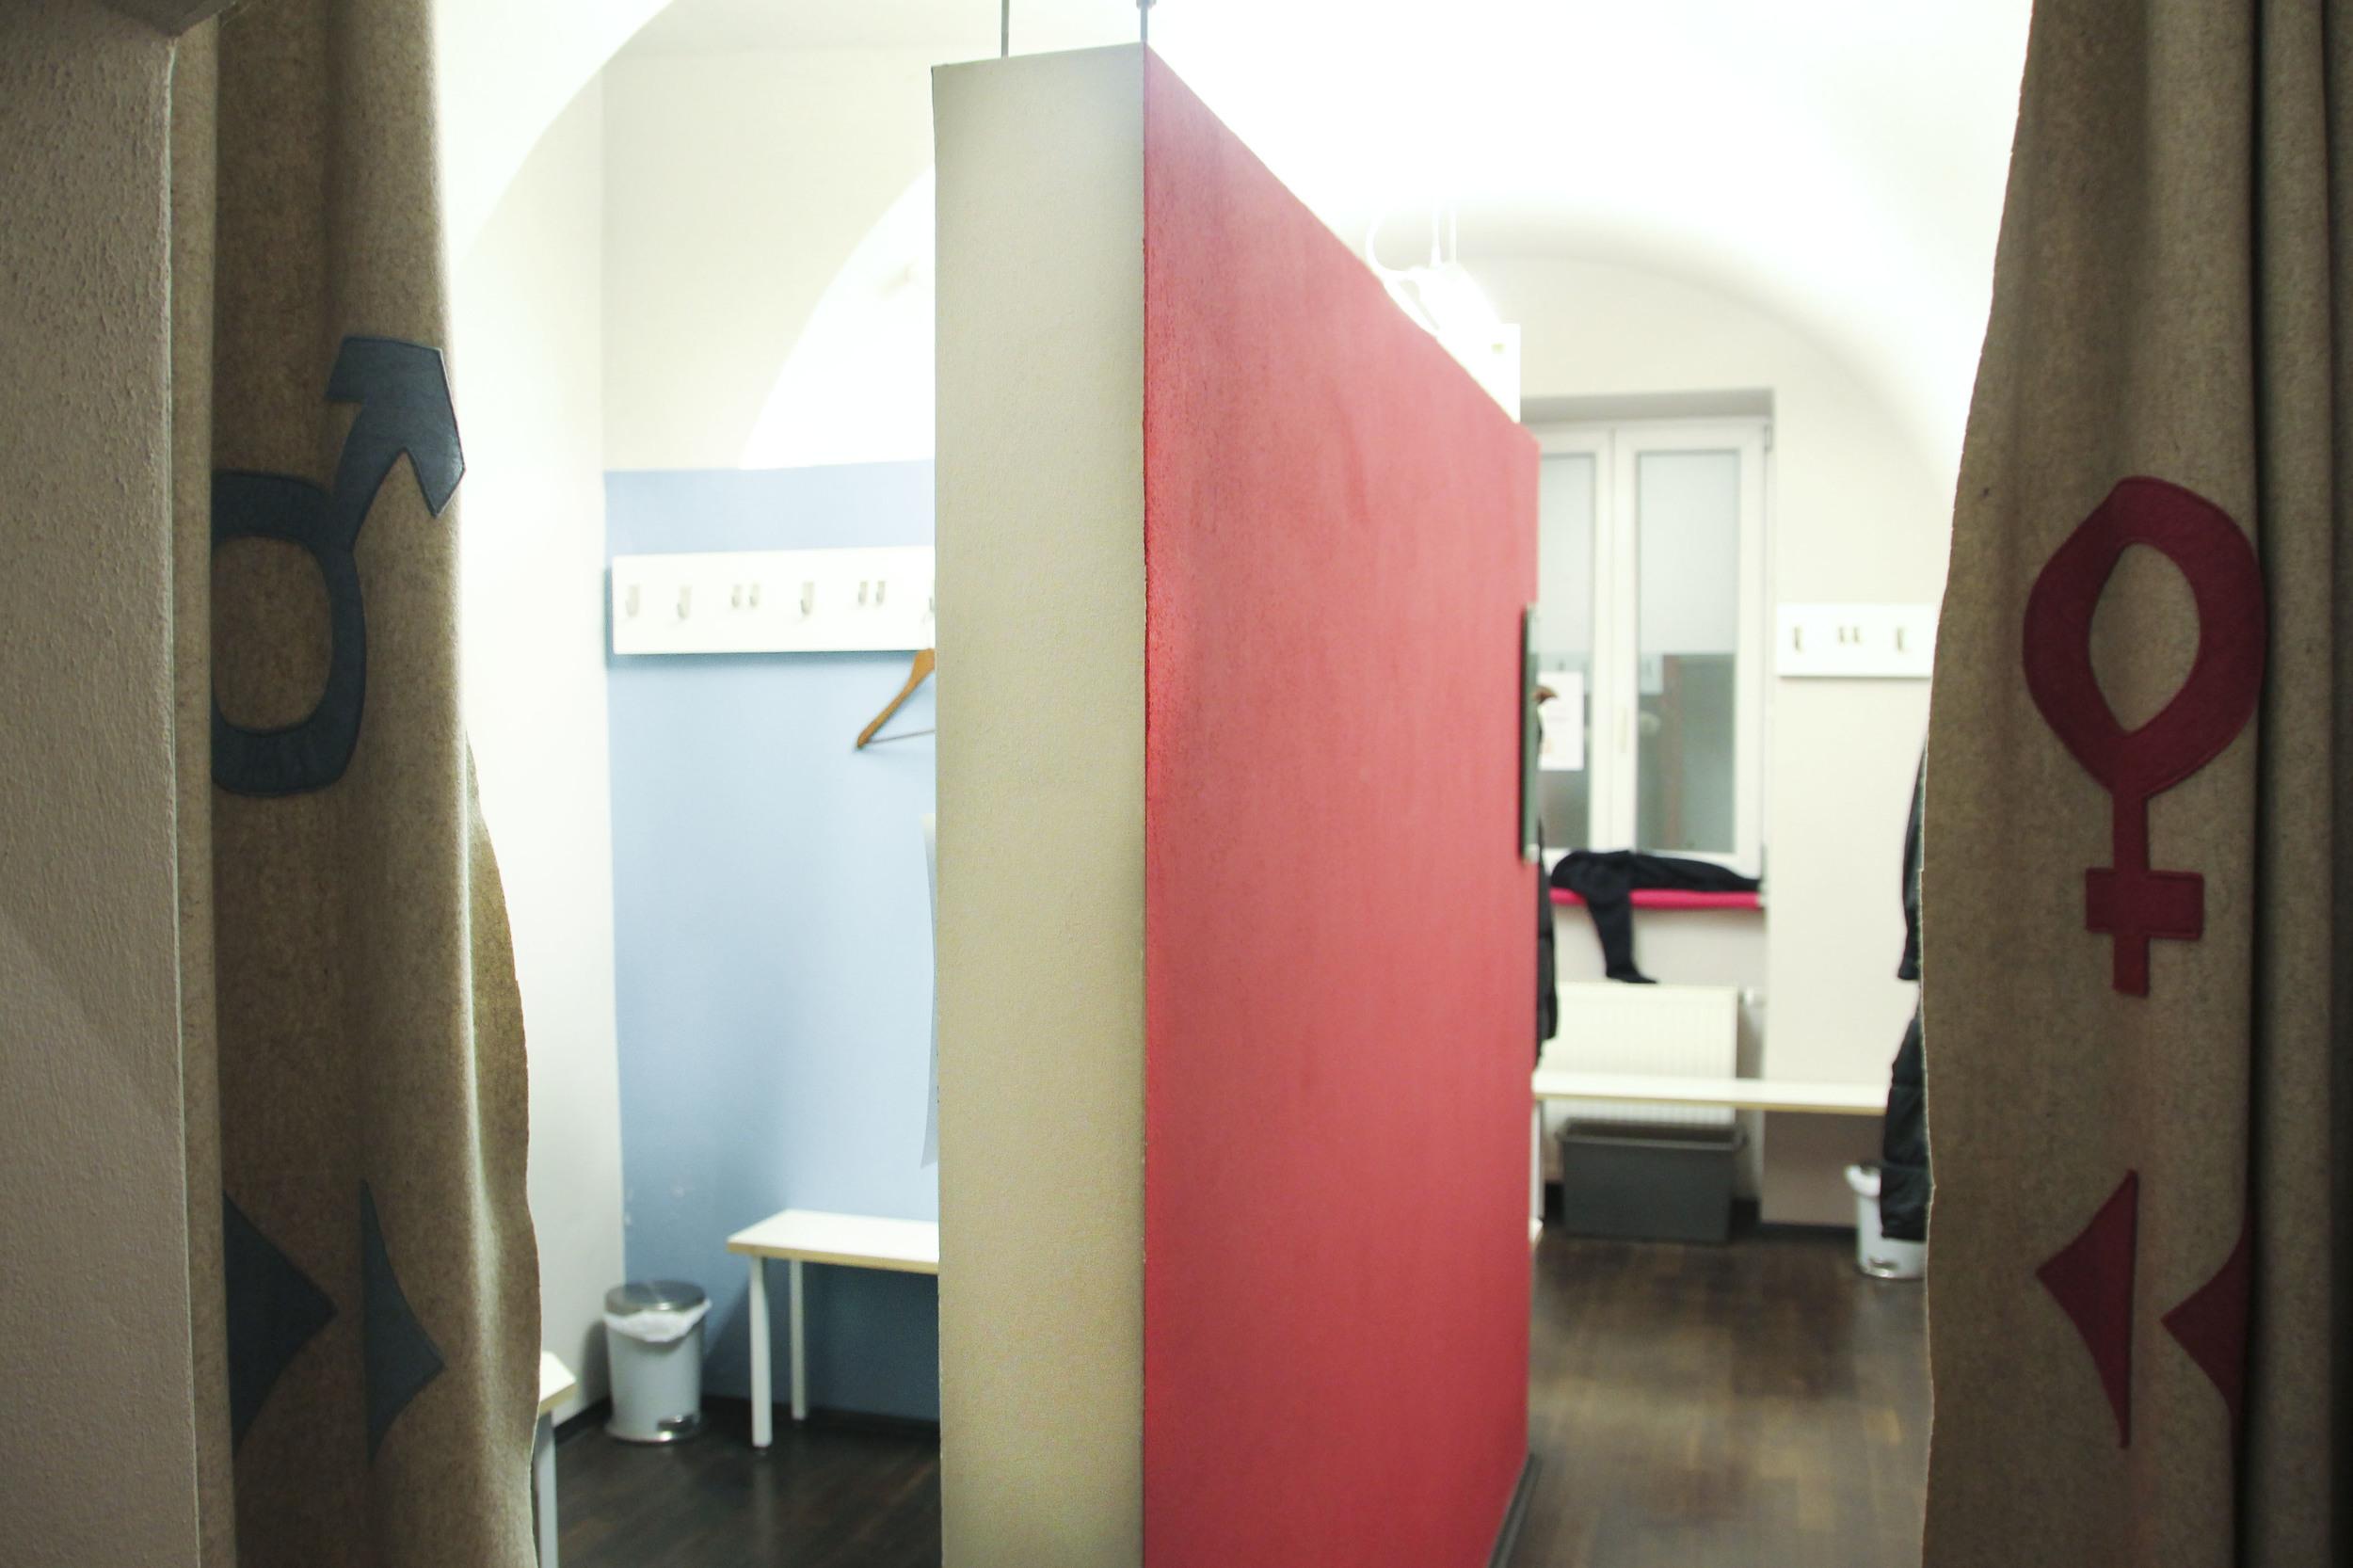 yoga studio werkstatt7 München765.jpg